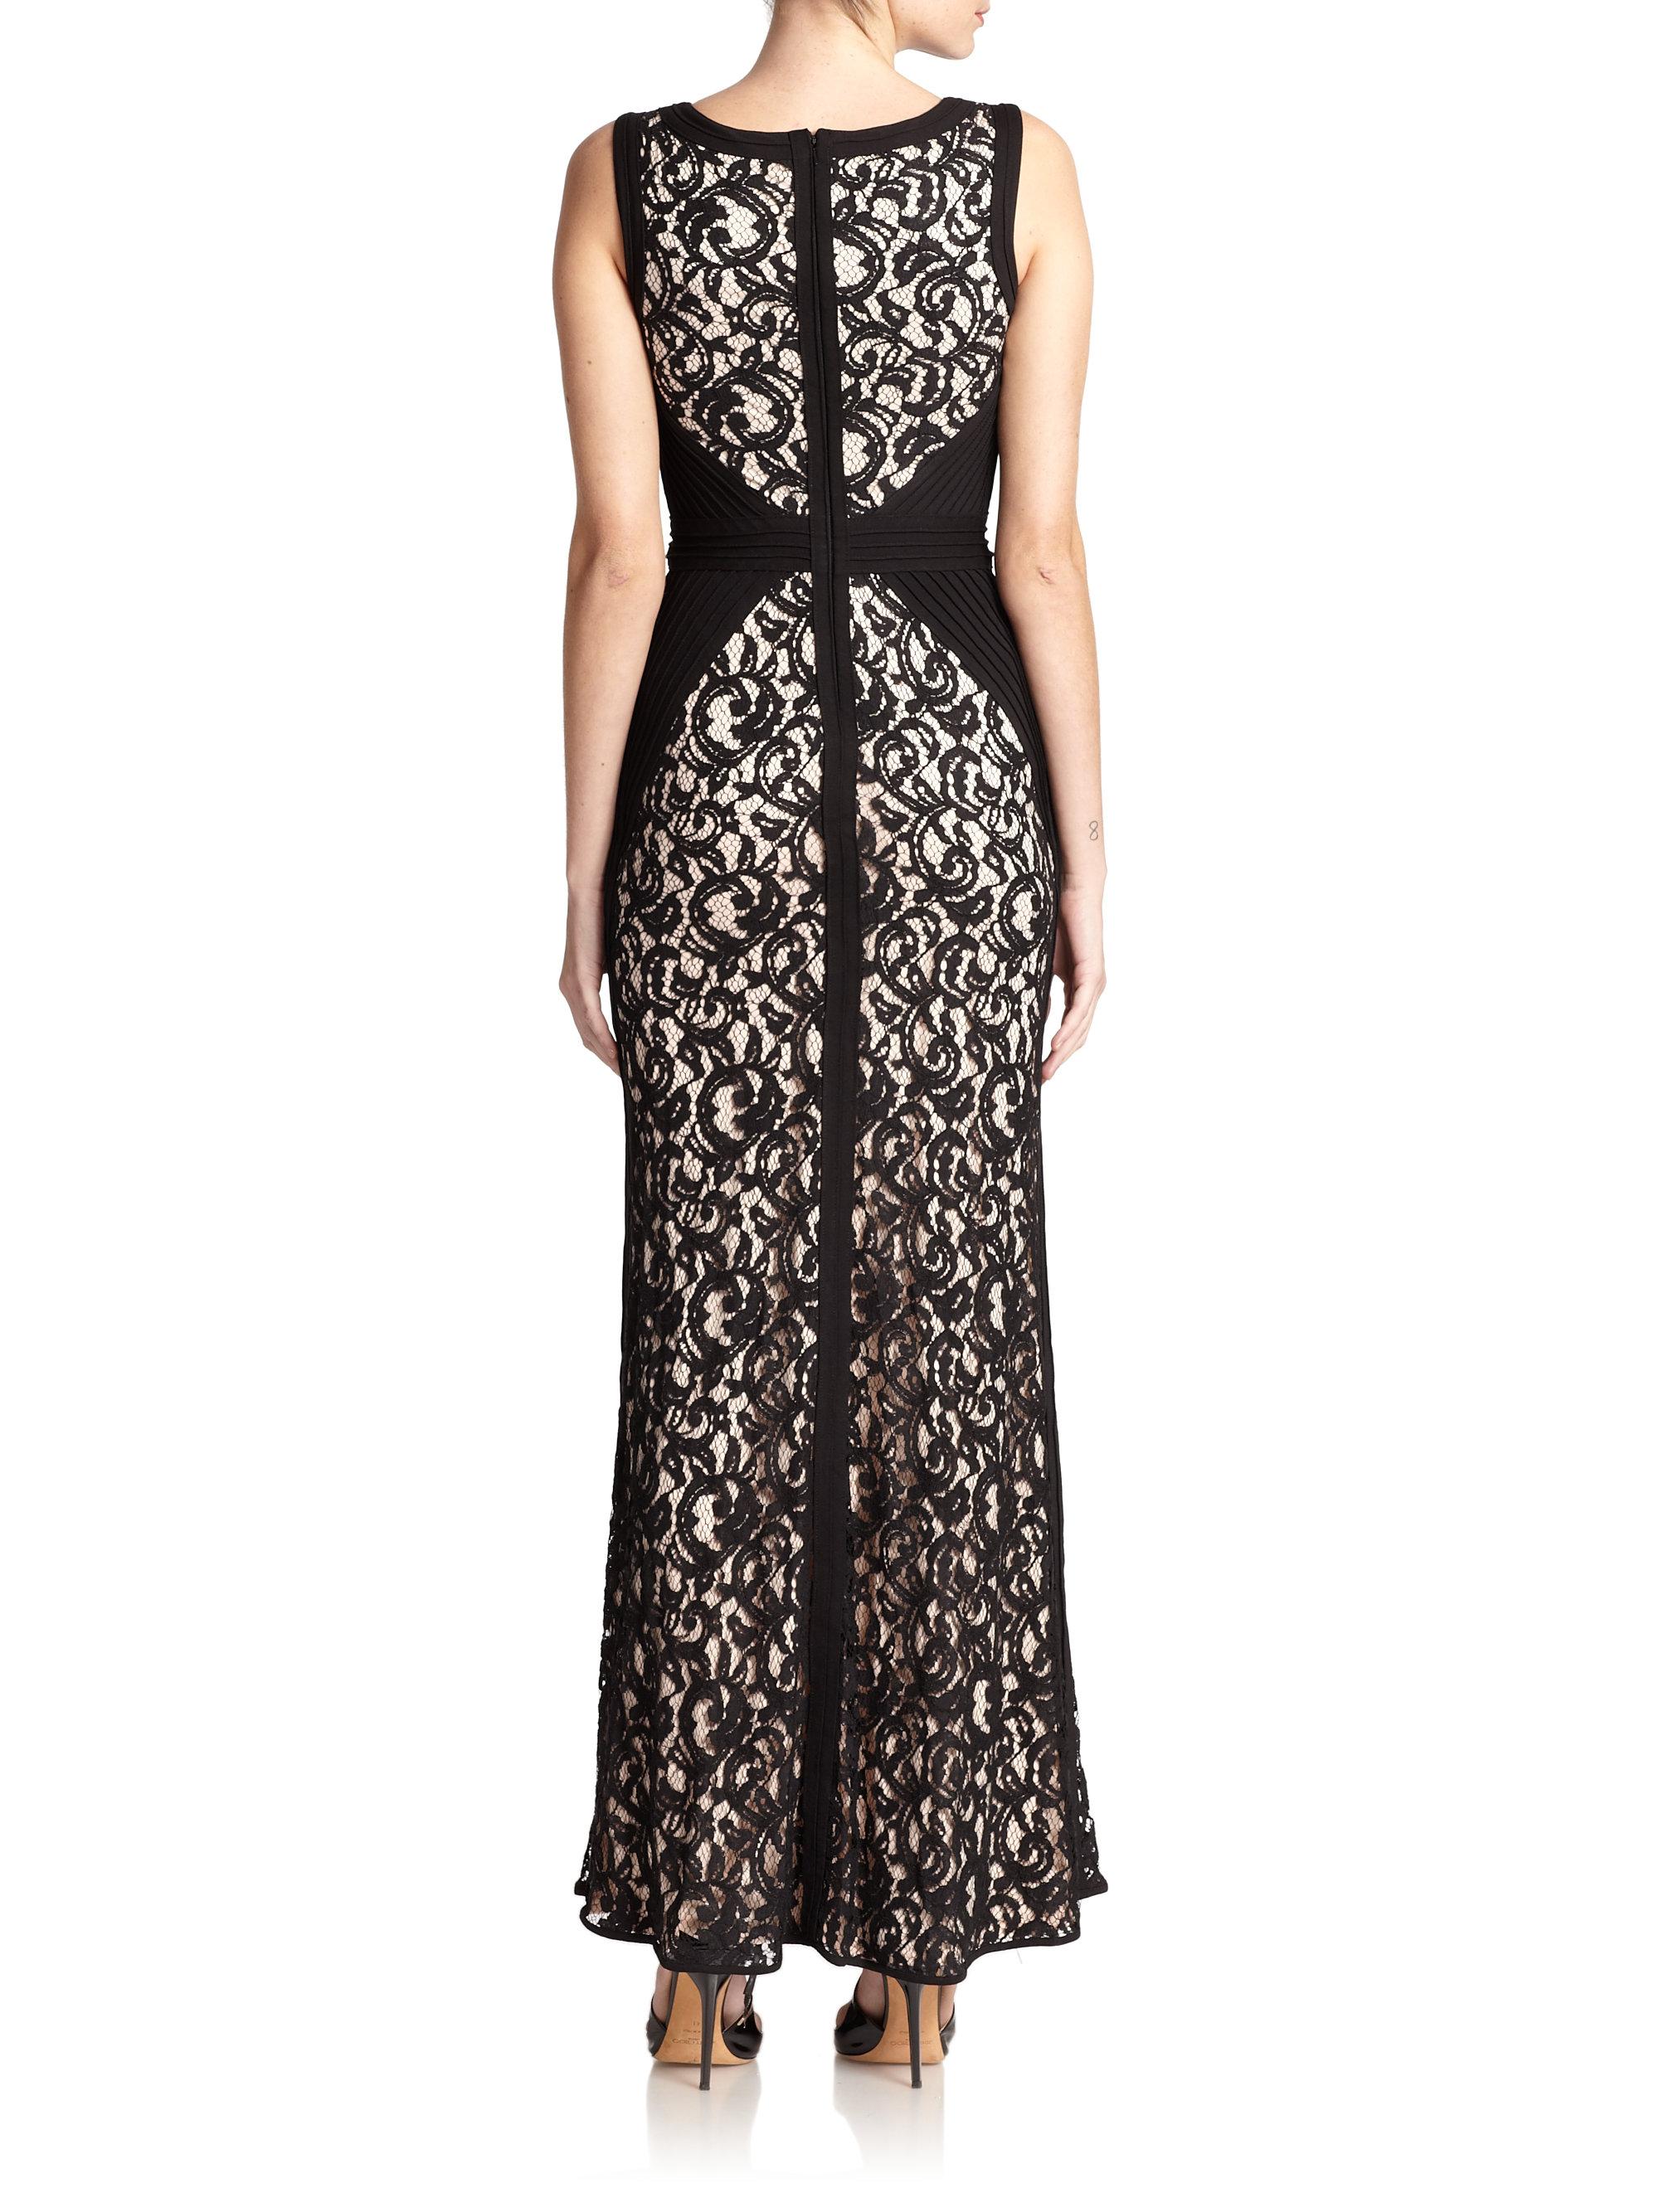 Tadashi Shoji Petite Cord Lace Gown In Black Lyst